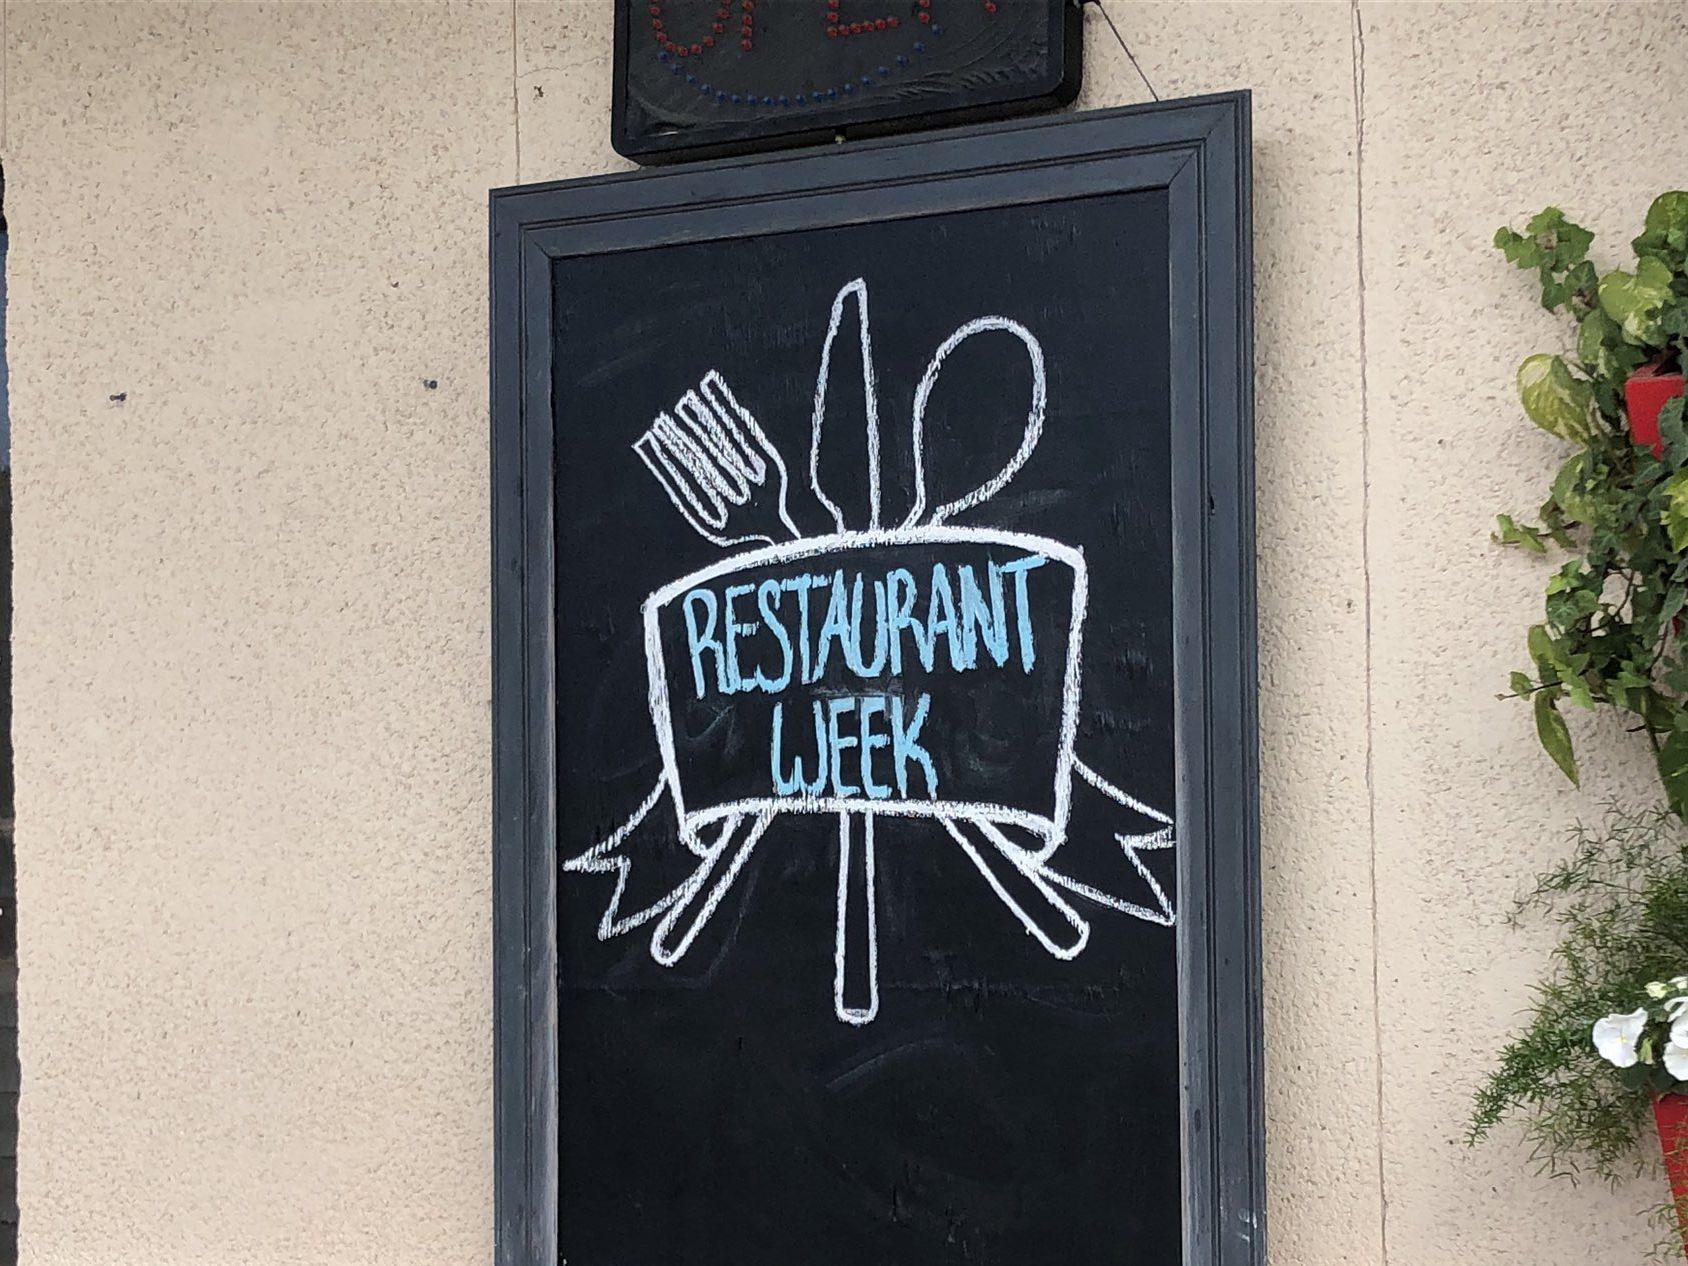 Tybee Island Restaurant Week promises special menus at low cost